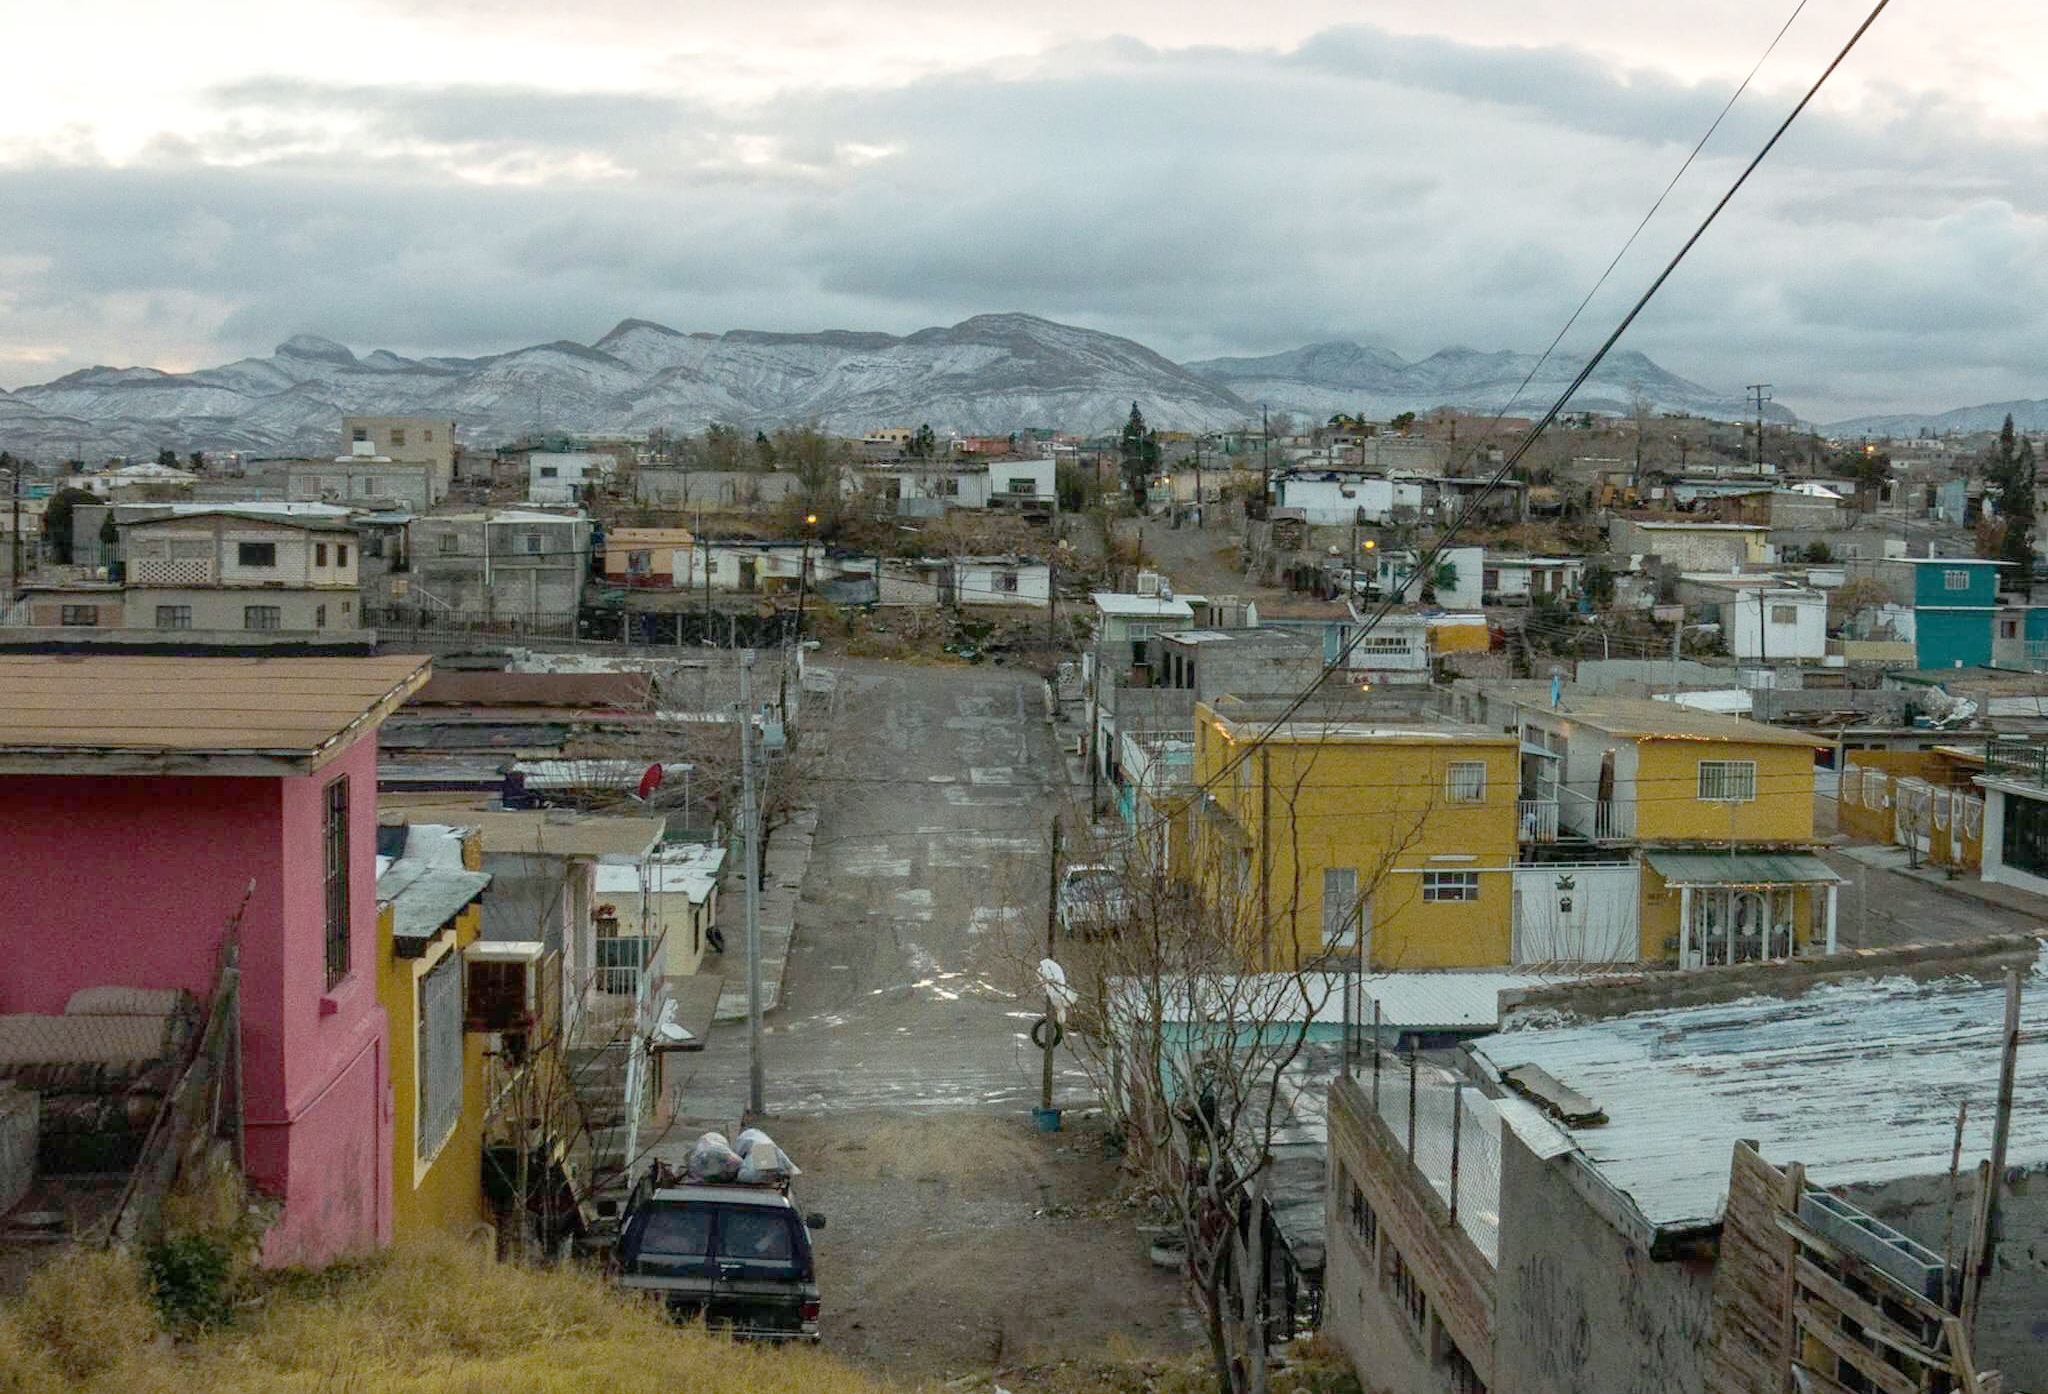 Image: Juárez / Photo Credit: Erick Garcia